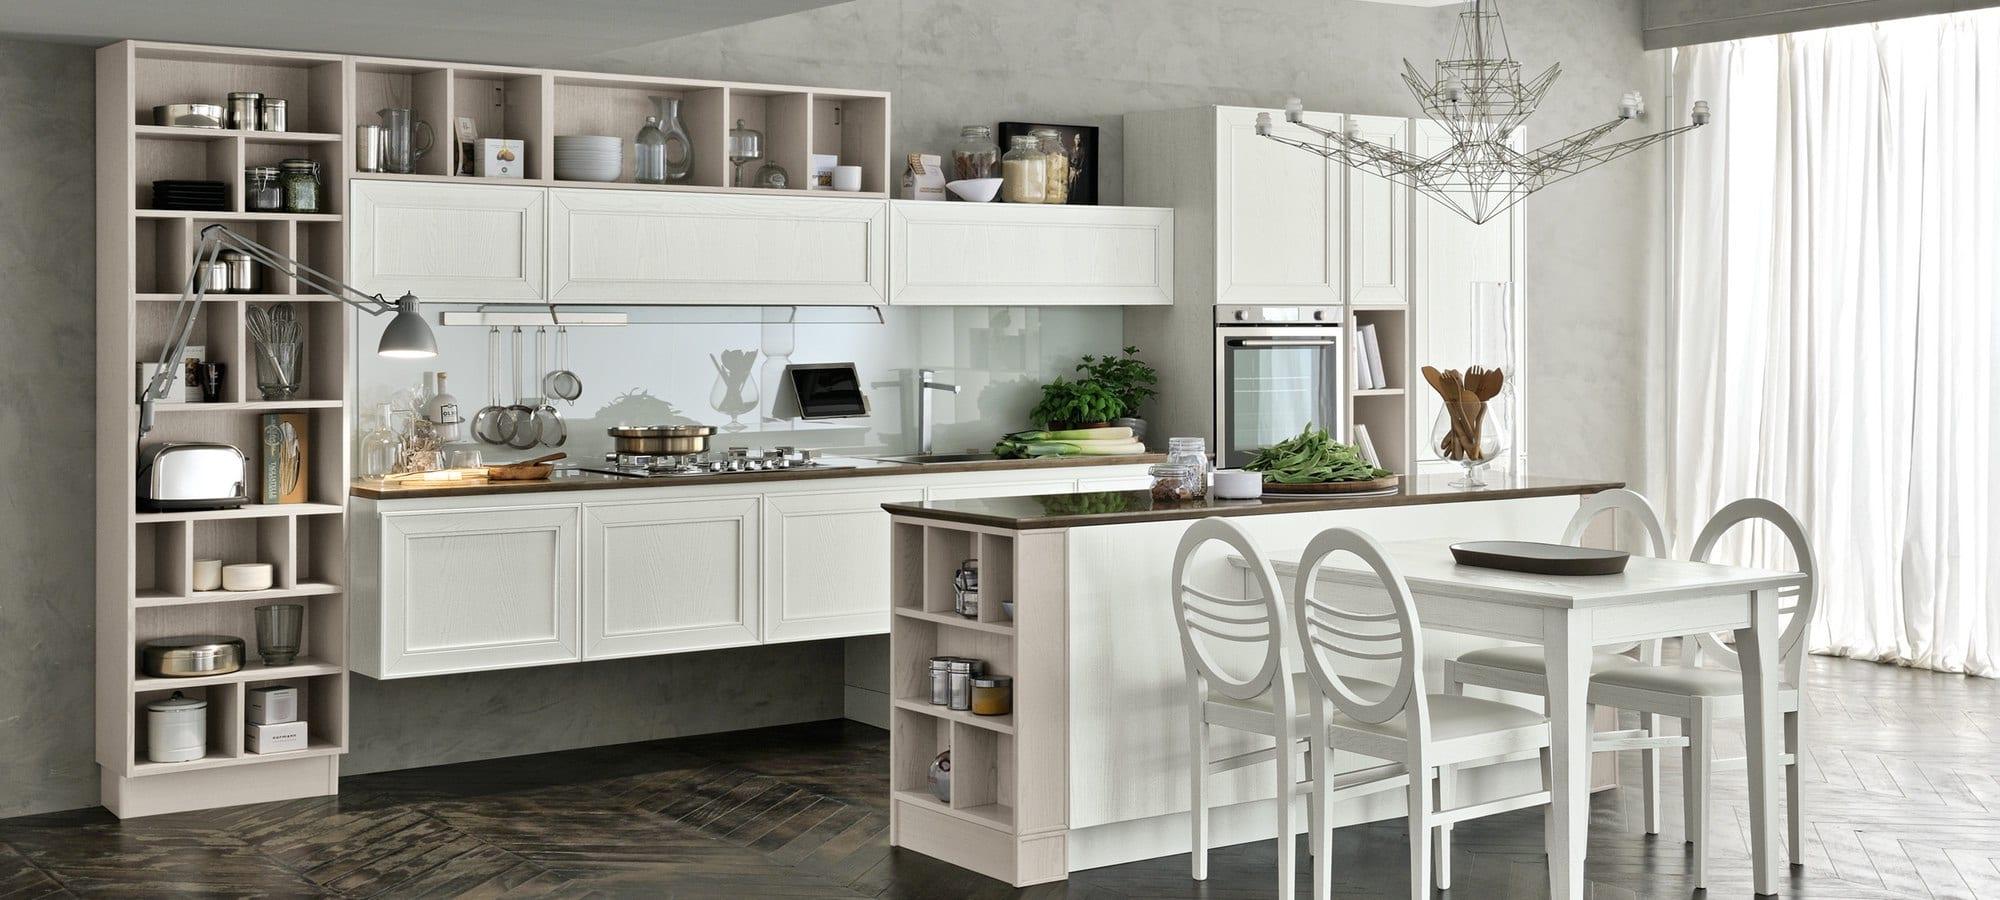 Cucina stosa raimondi idee casa - Bruni cucine sora ...